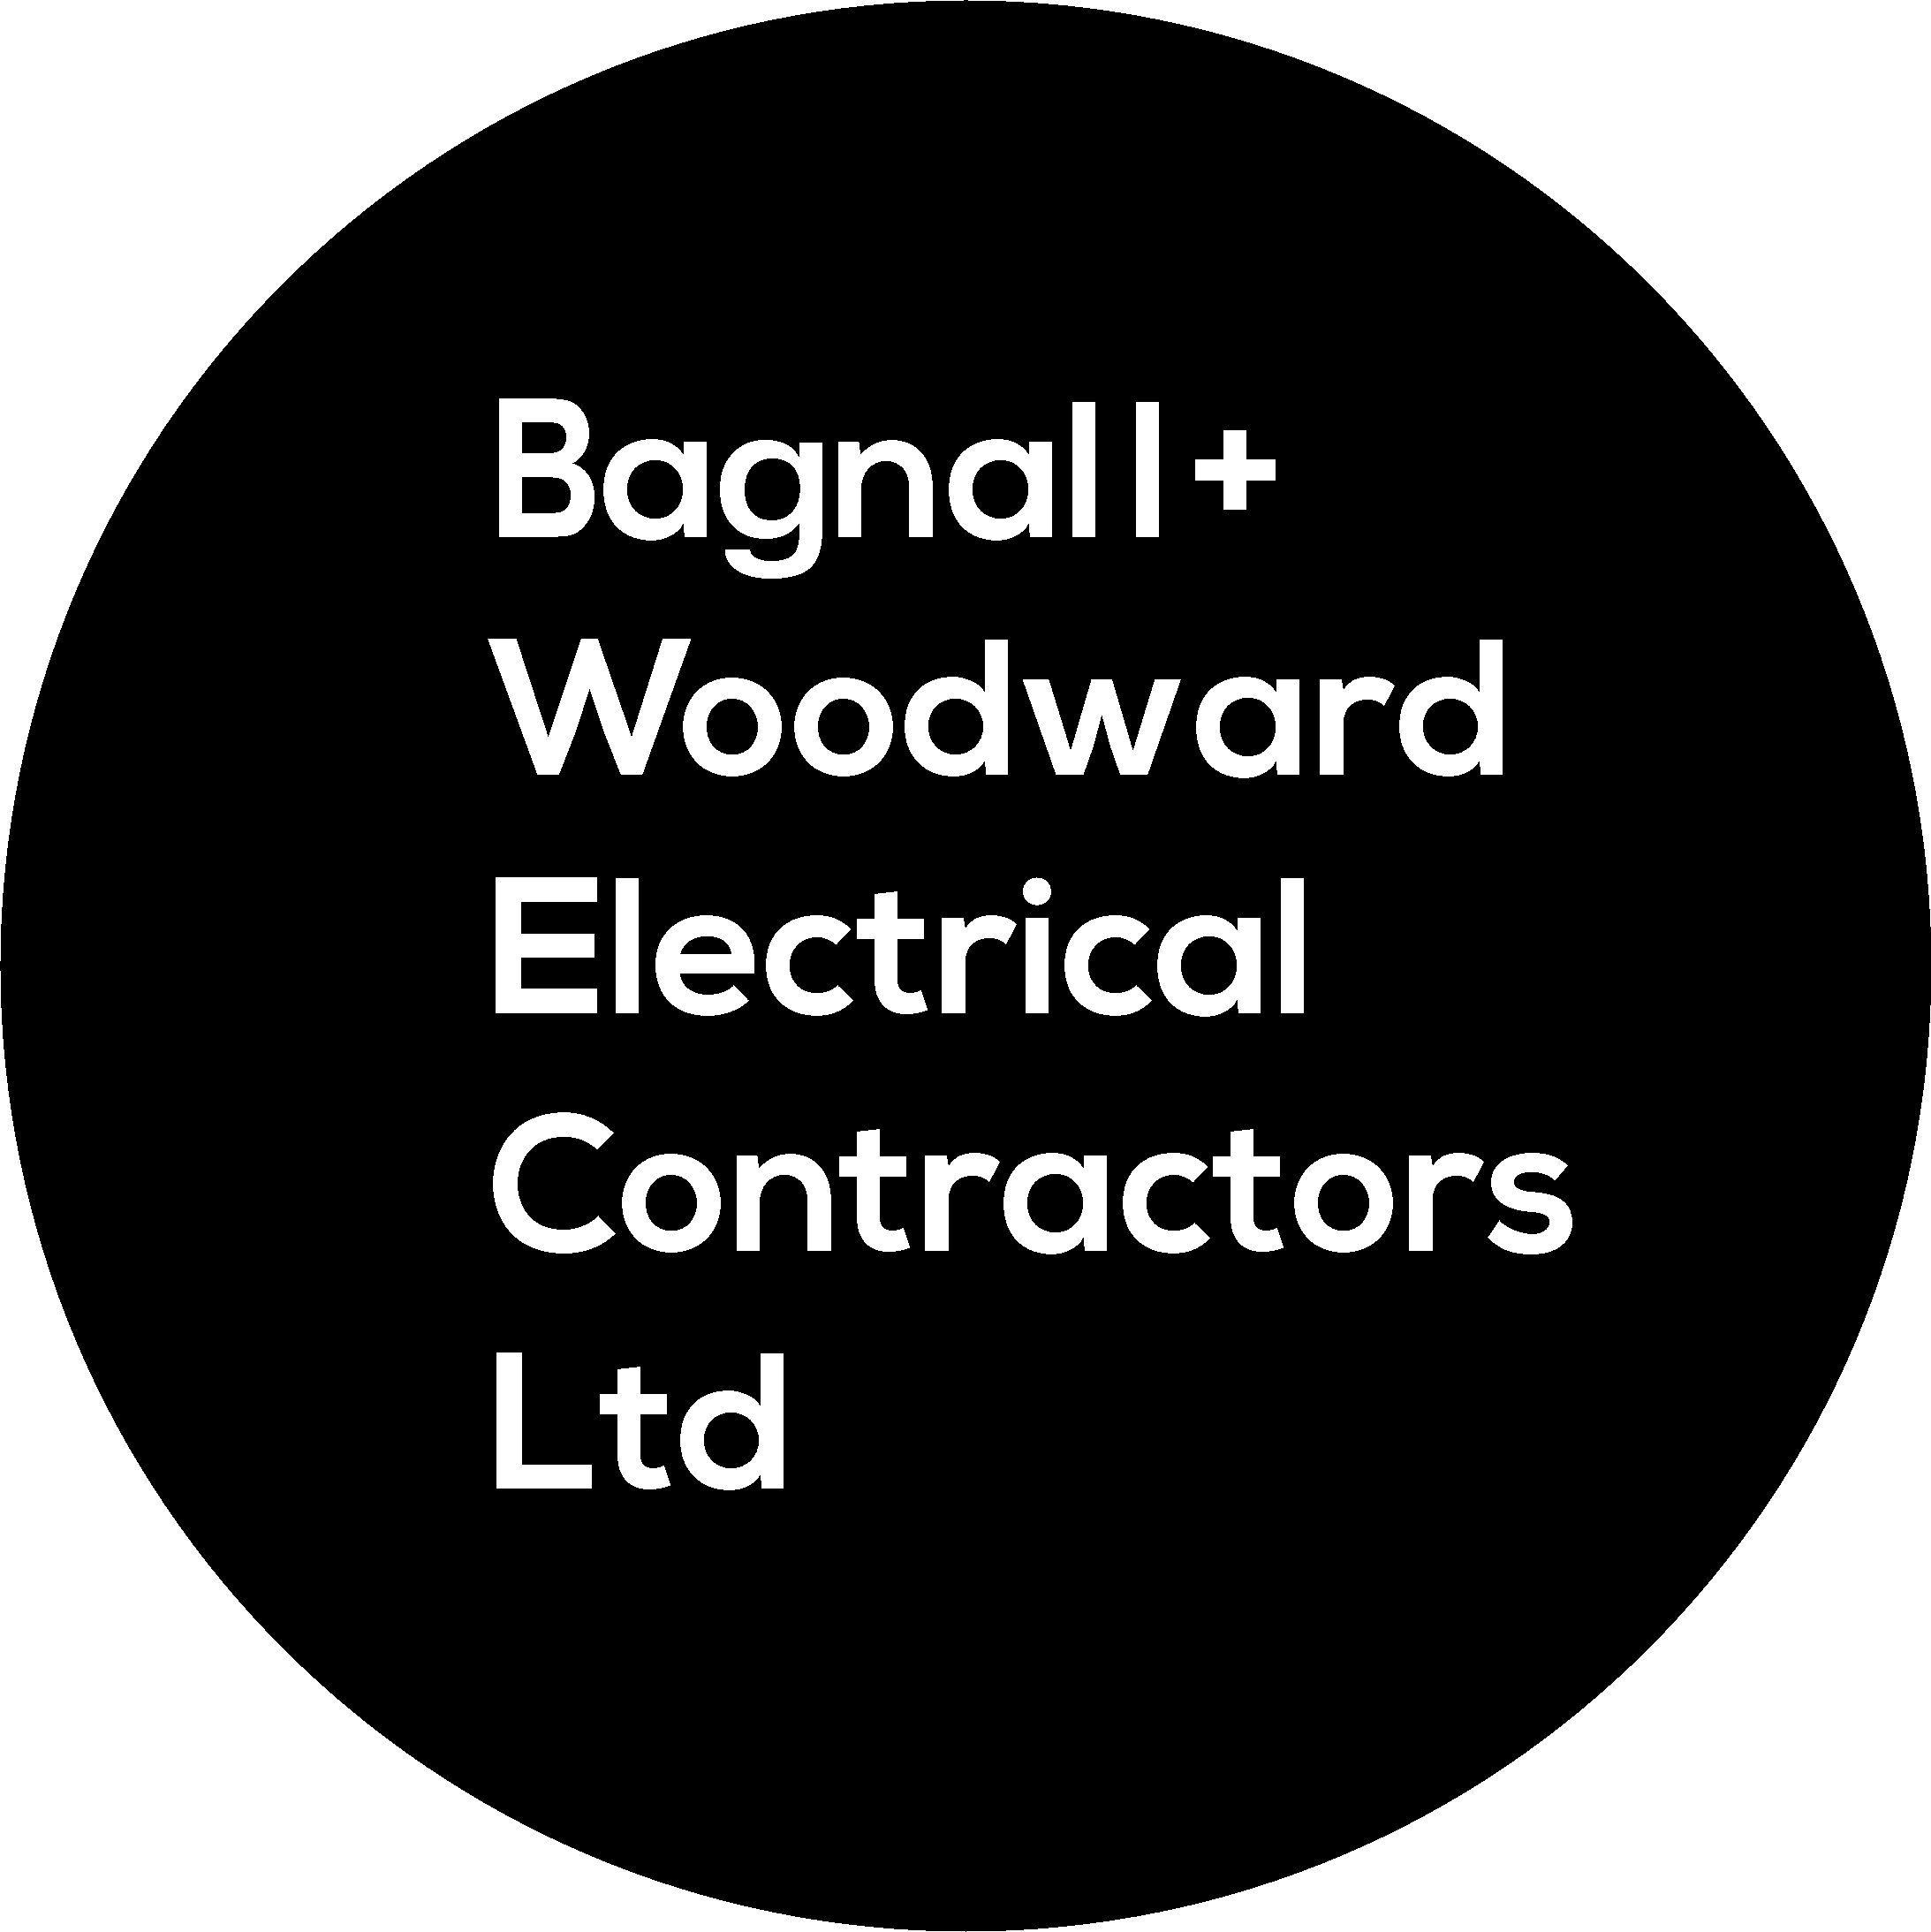 Ian Woodward – Bagnall + Woodward Electrical Contractors Ltd